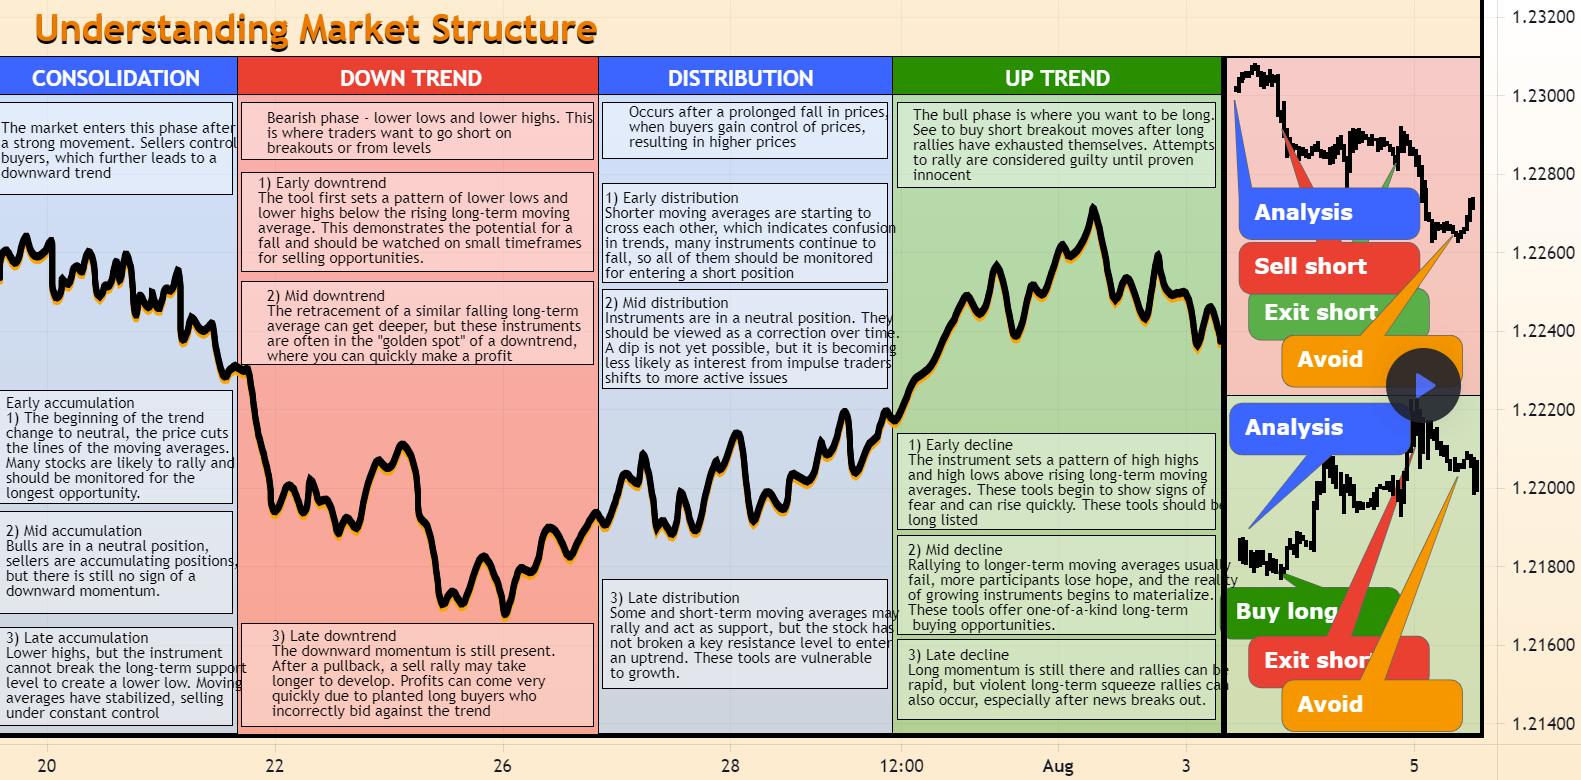 Understanding Market Structure